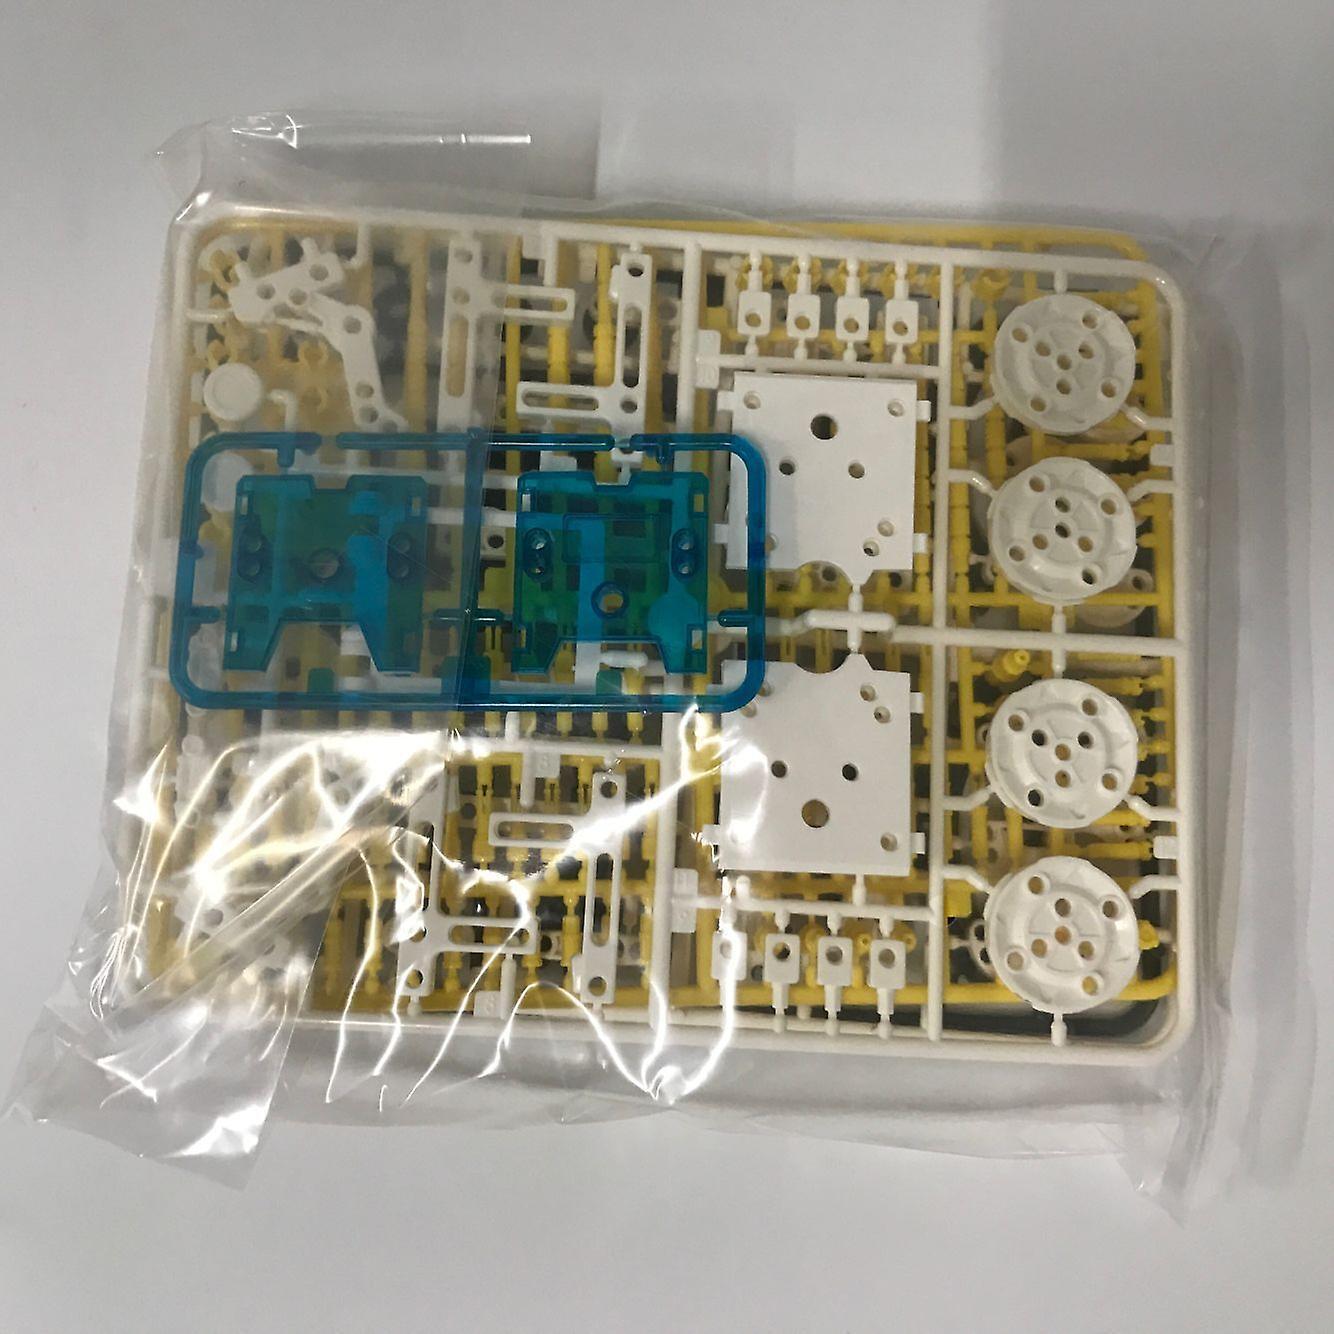 13 In 1 Educational Solar Power Robot Kit Diy Car ...